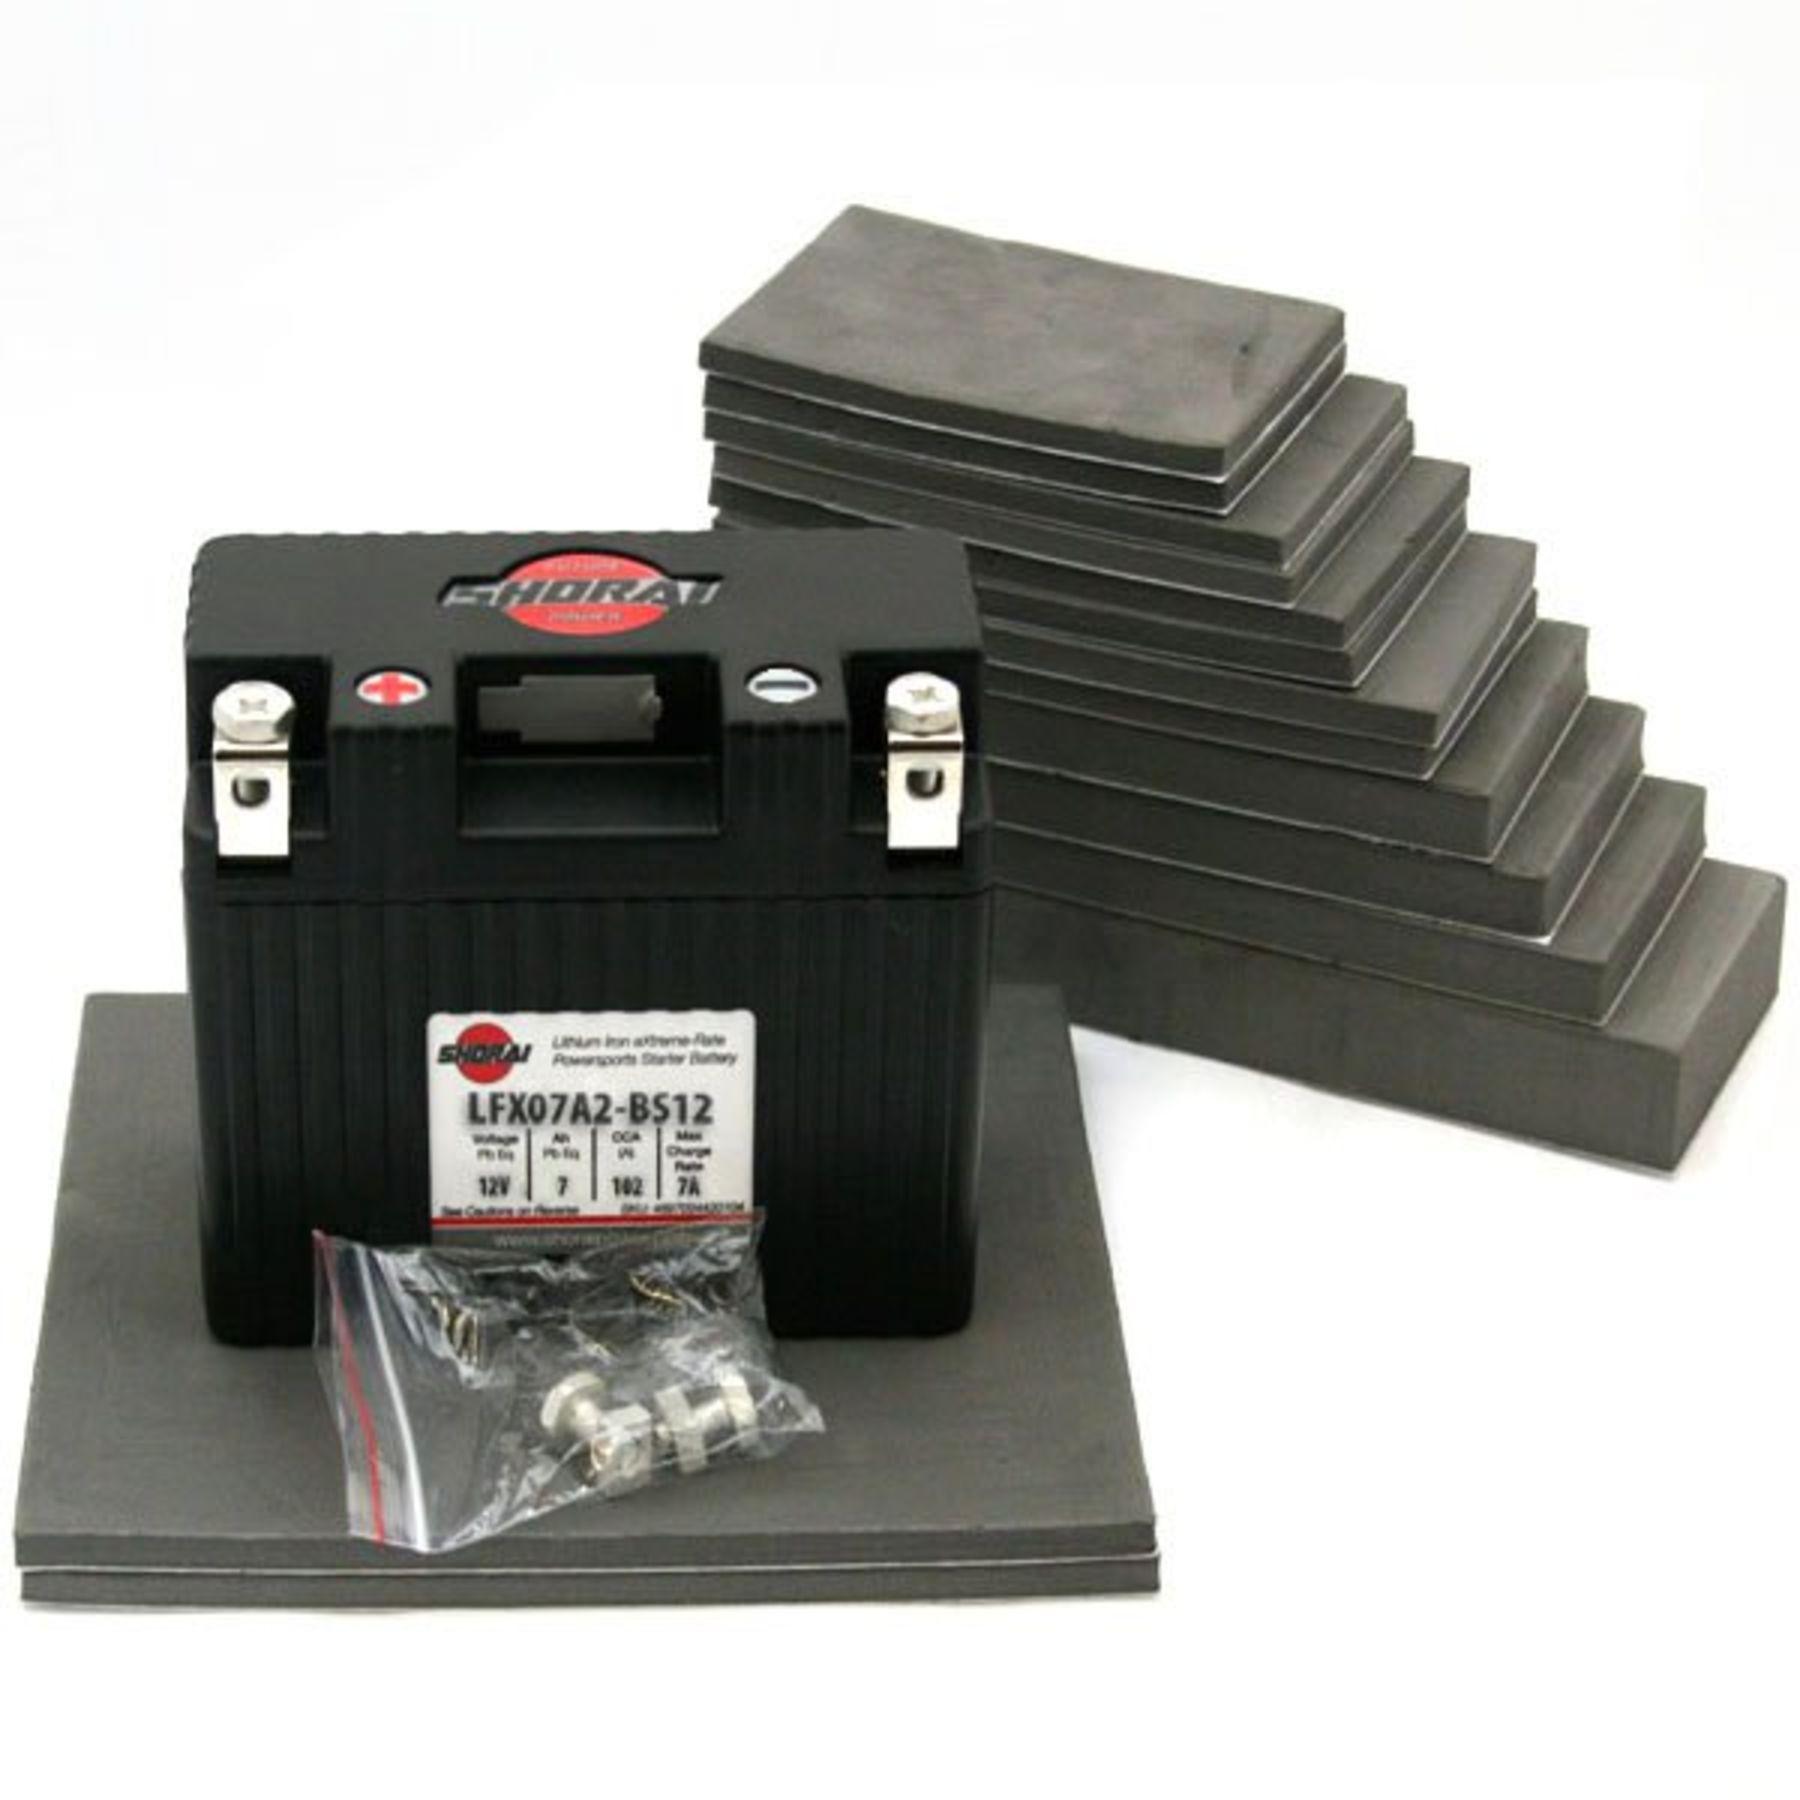 Lifepo4 Battery 9ah 12v Lithium Motorcycle Atv Batteries Lfx09a2 1969 Cb175 Wiring Diagram Bs12